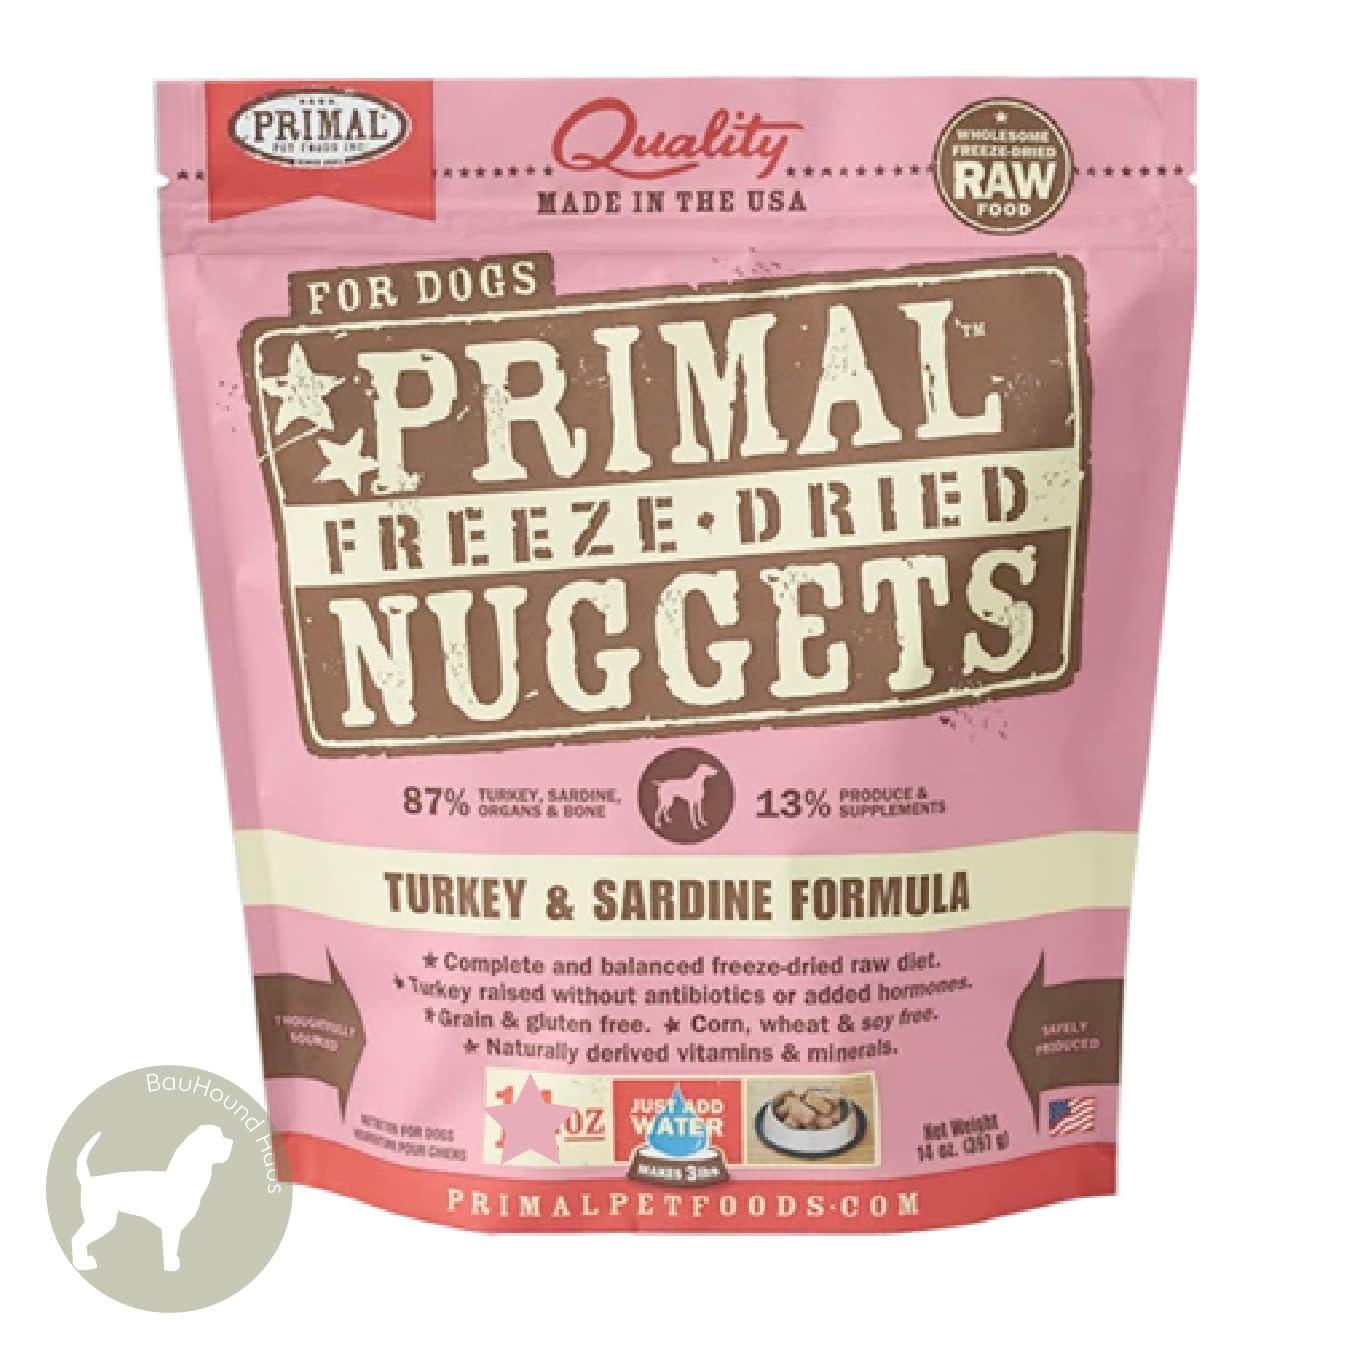 Primal Pet Foods Primal Pet Foods Freeze Dried Formula Turkey & Sardine, 14oz